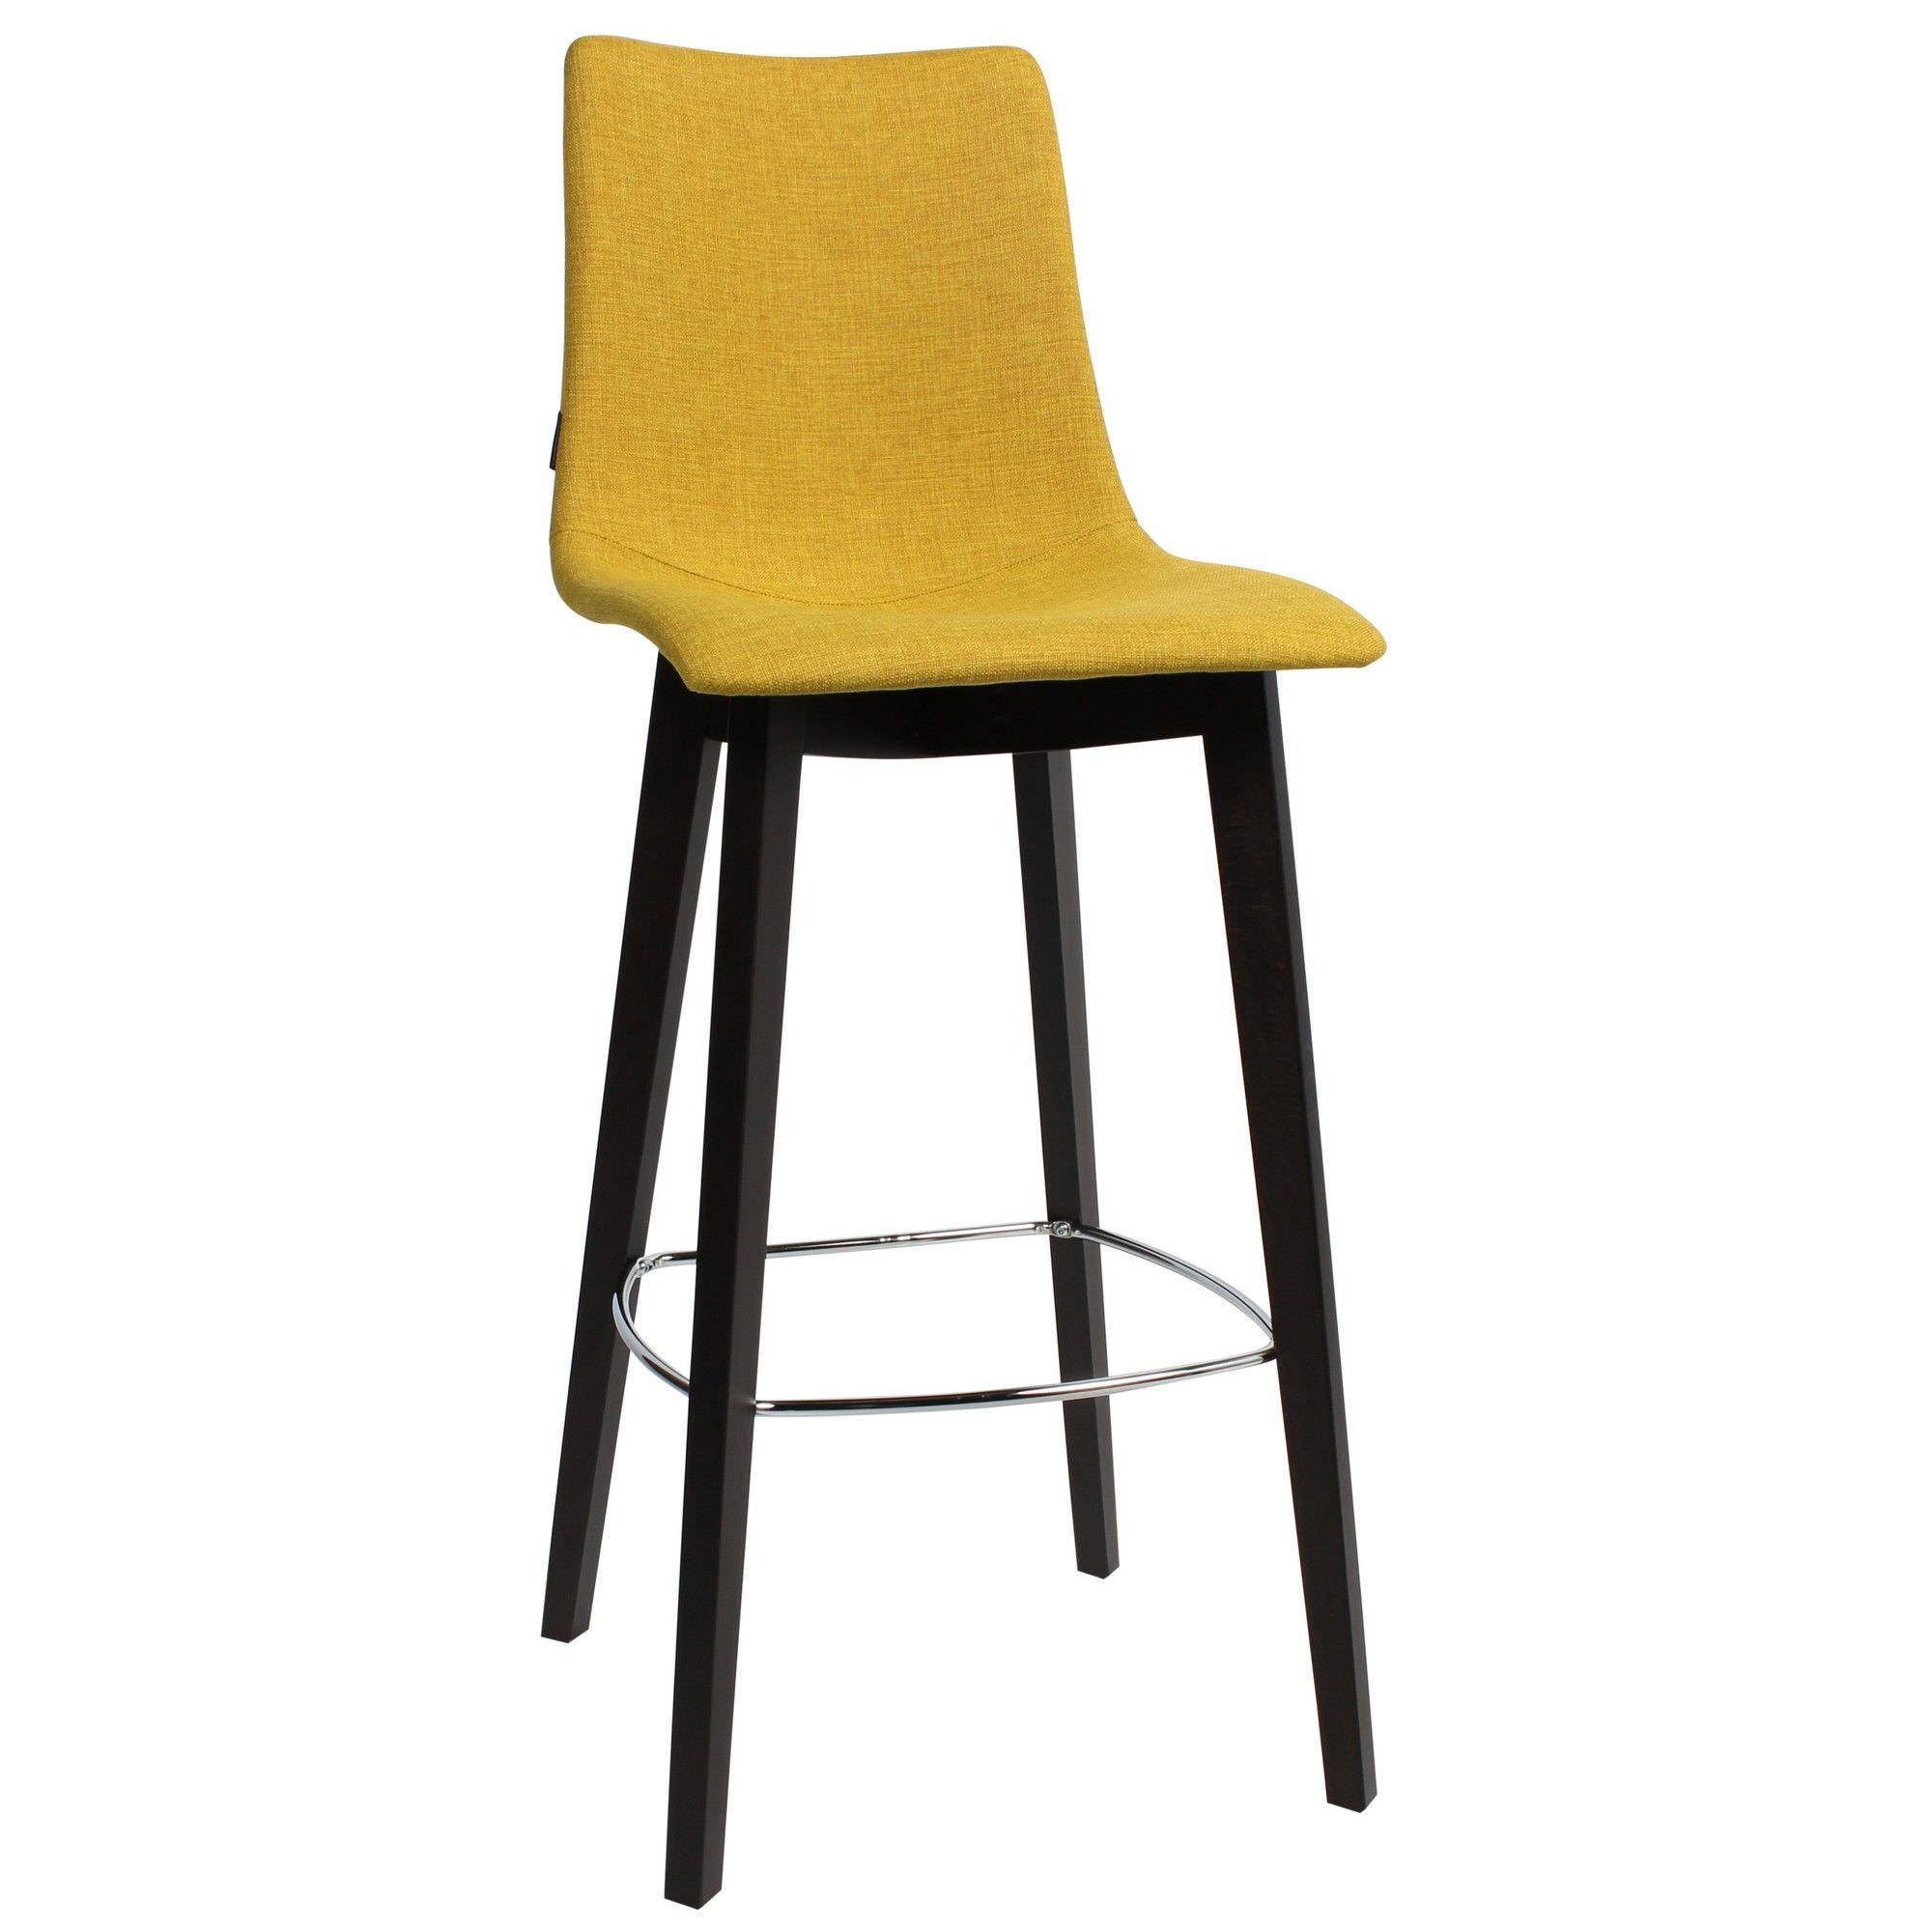 Zebra Pop Italian Made Commercial Grade Fabric Bar Stool, Timber Leg, Saffron / Wenge